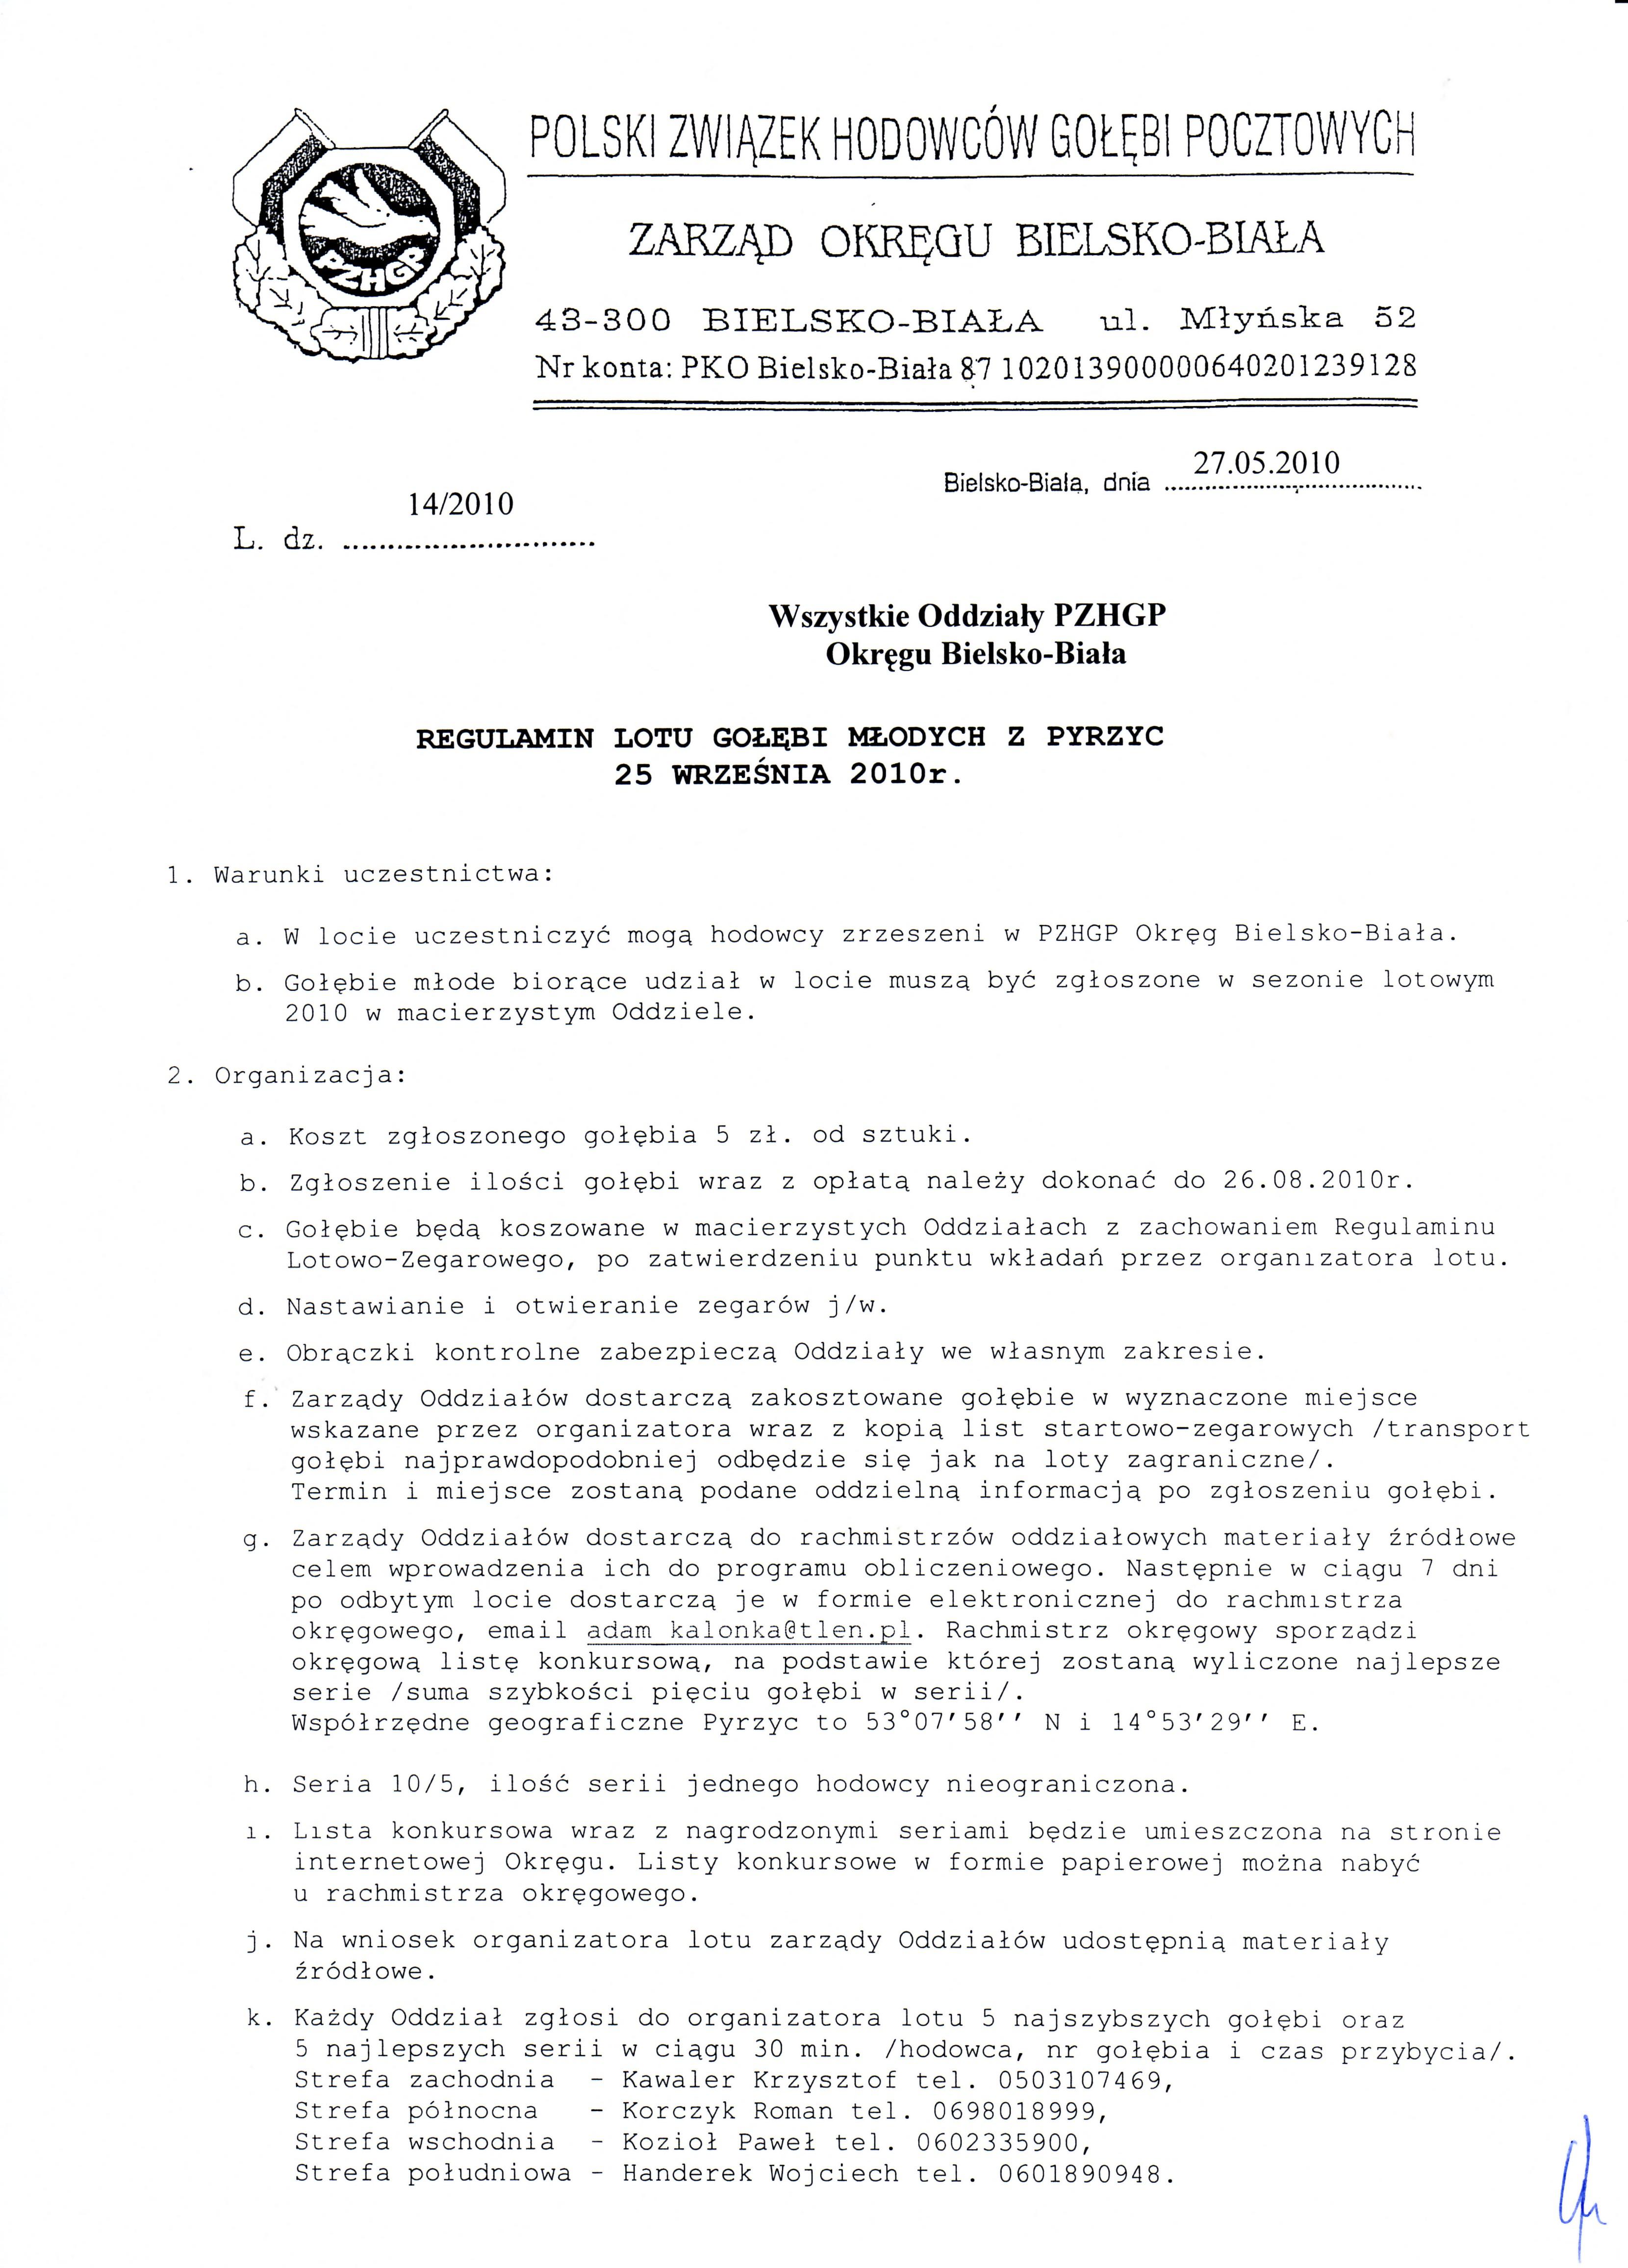 Regulamin Pyrzyce.